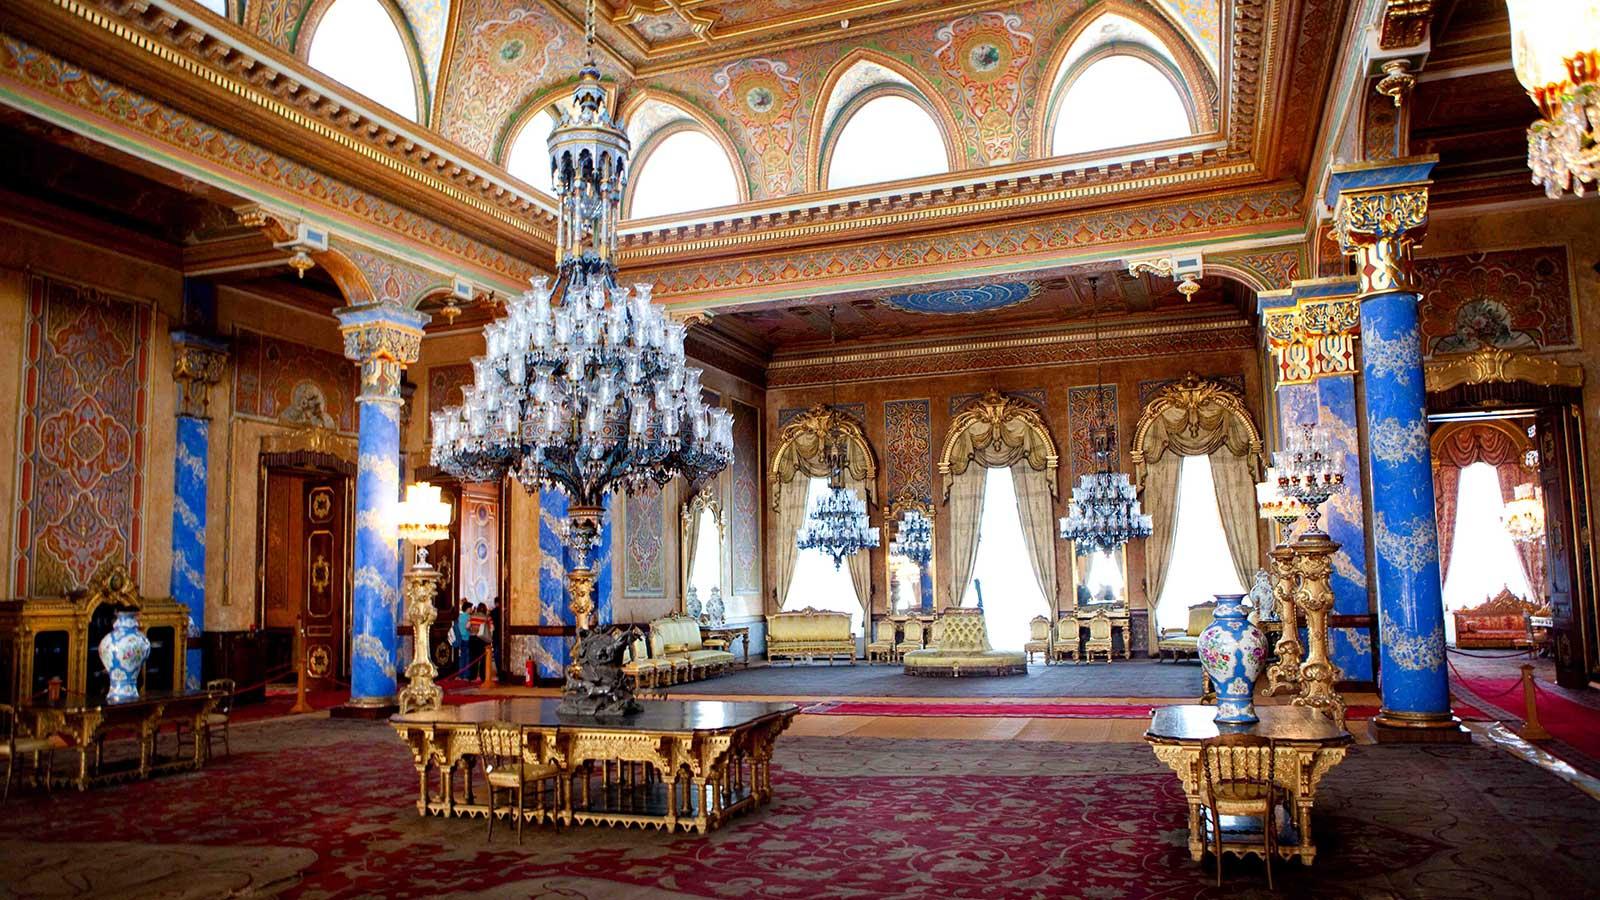 Beylerbeyi Palace Museum, Istanbul